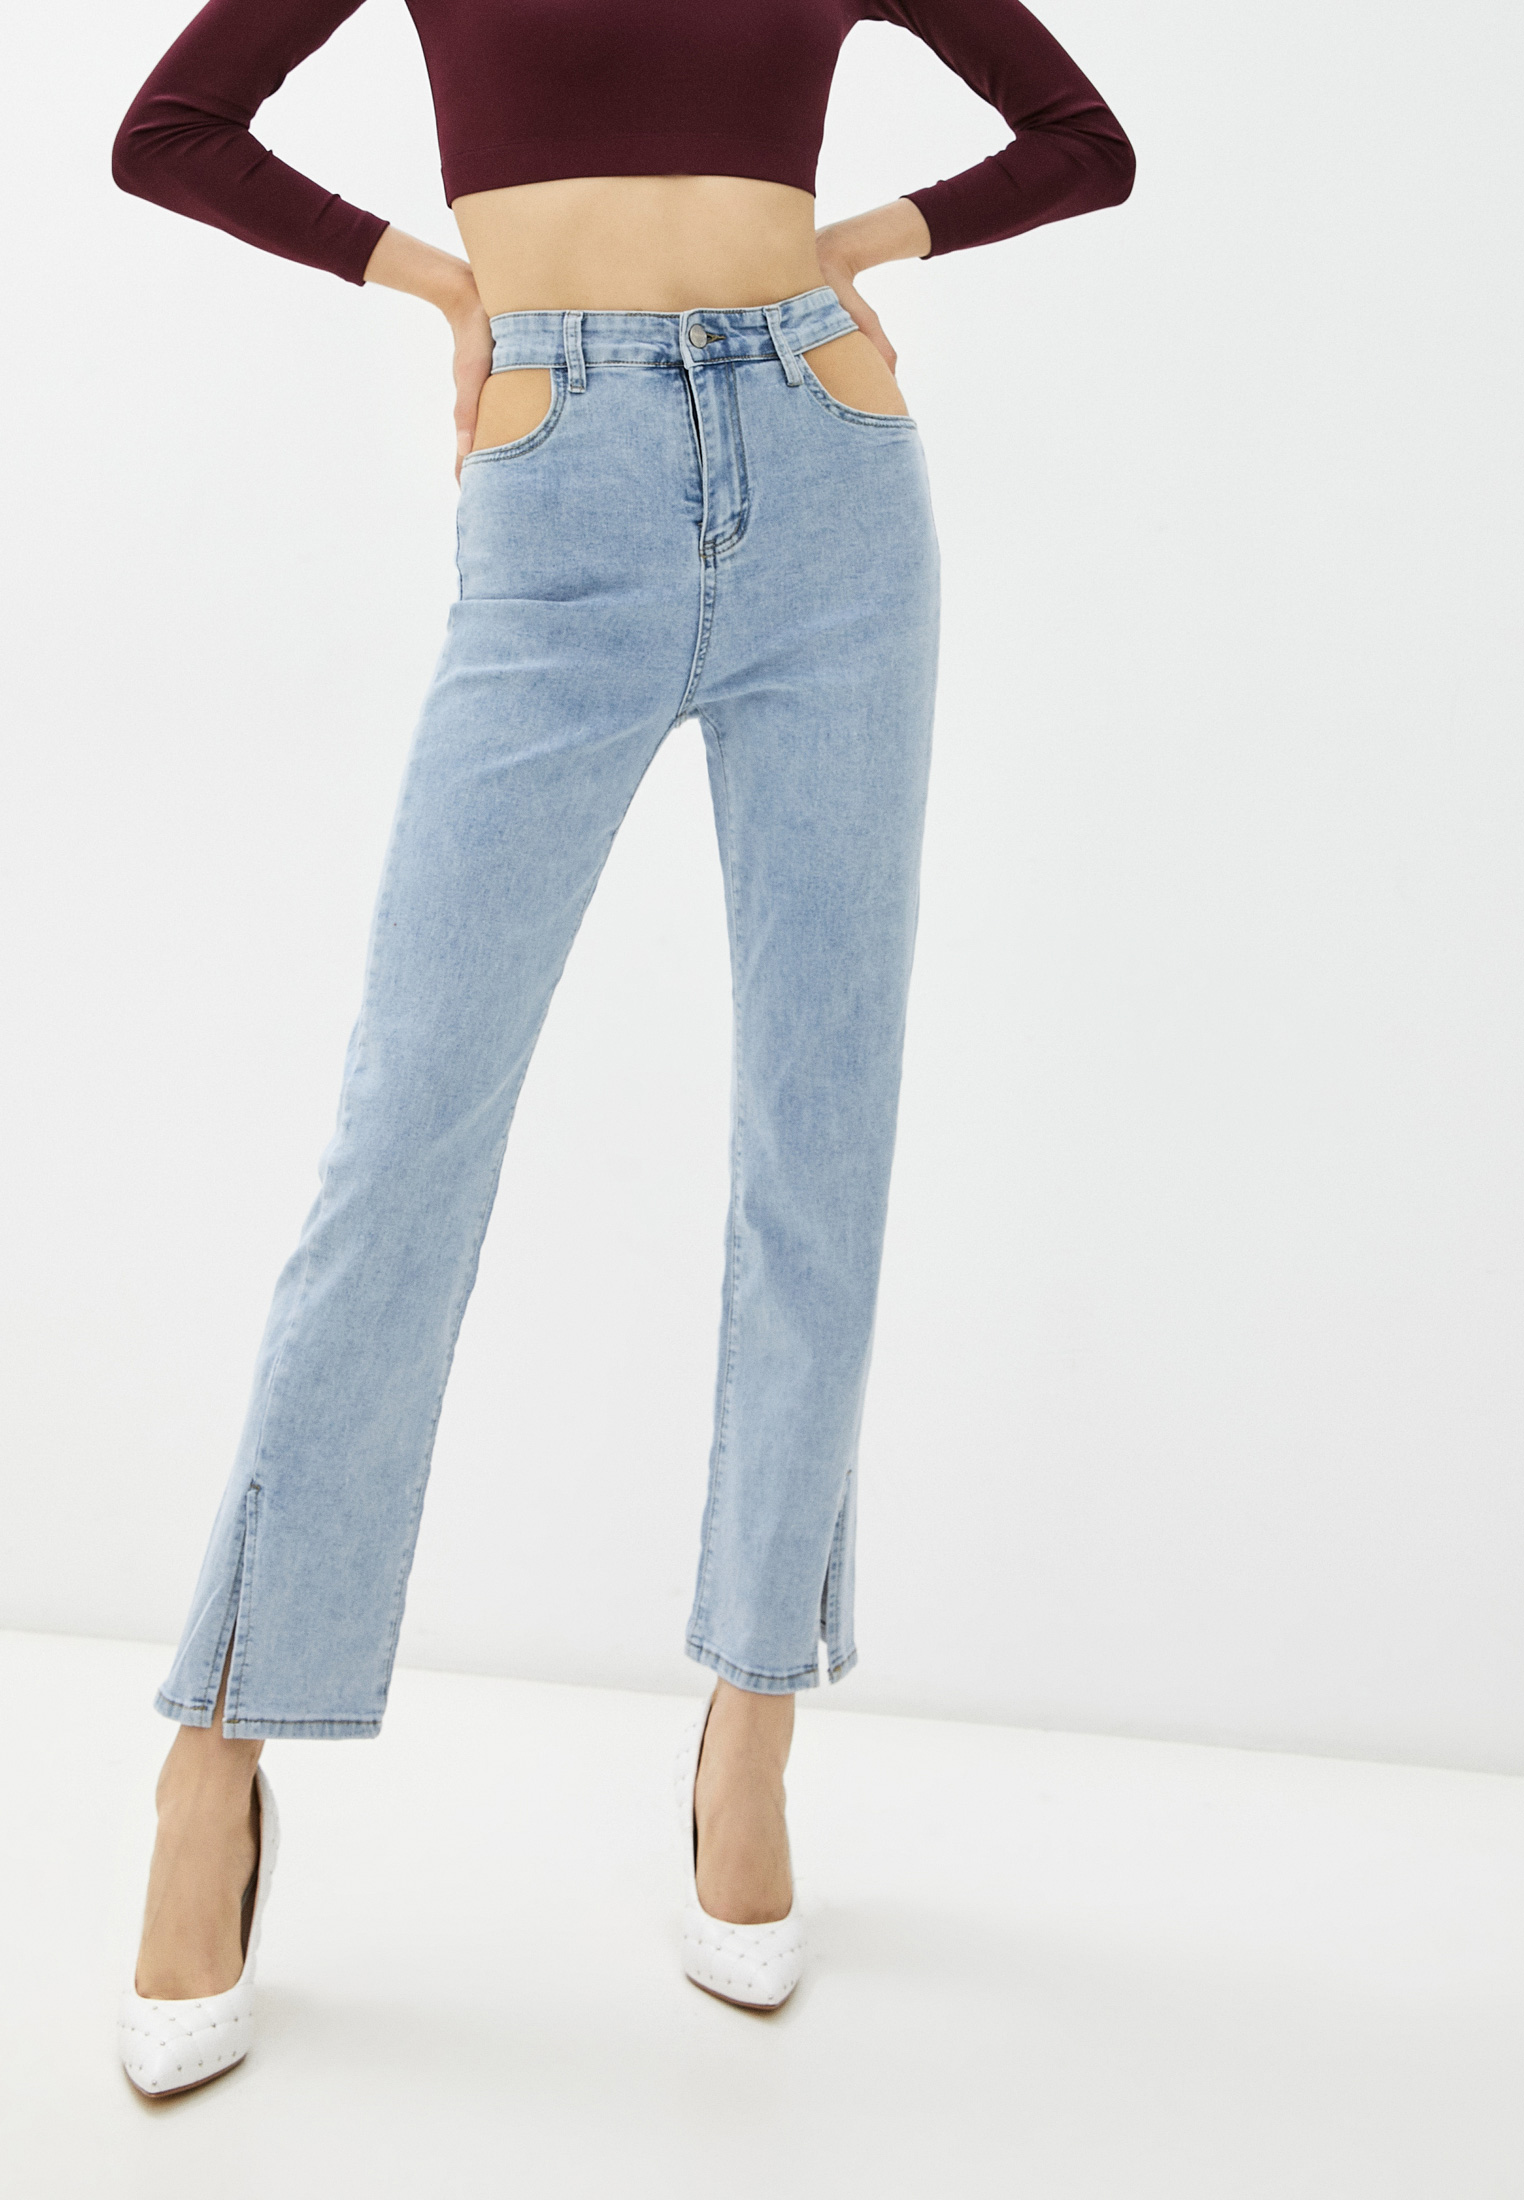 Прямые джинсы Miss Gabby 88802